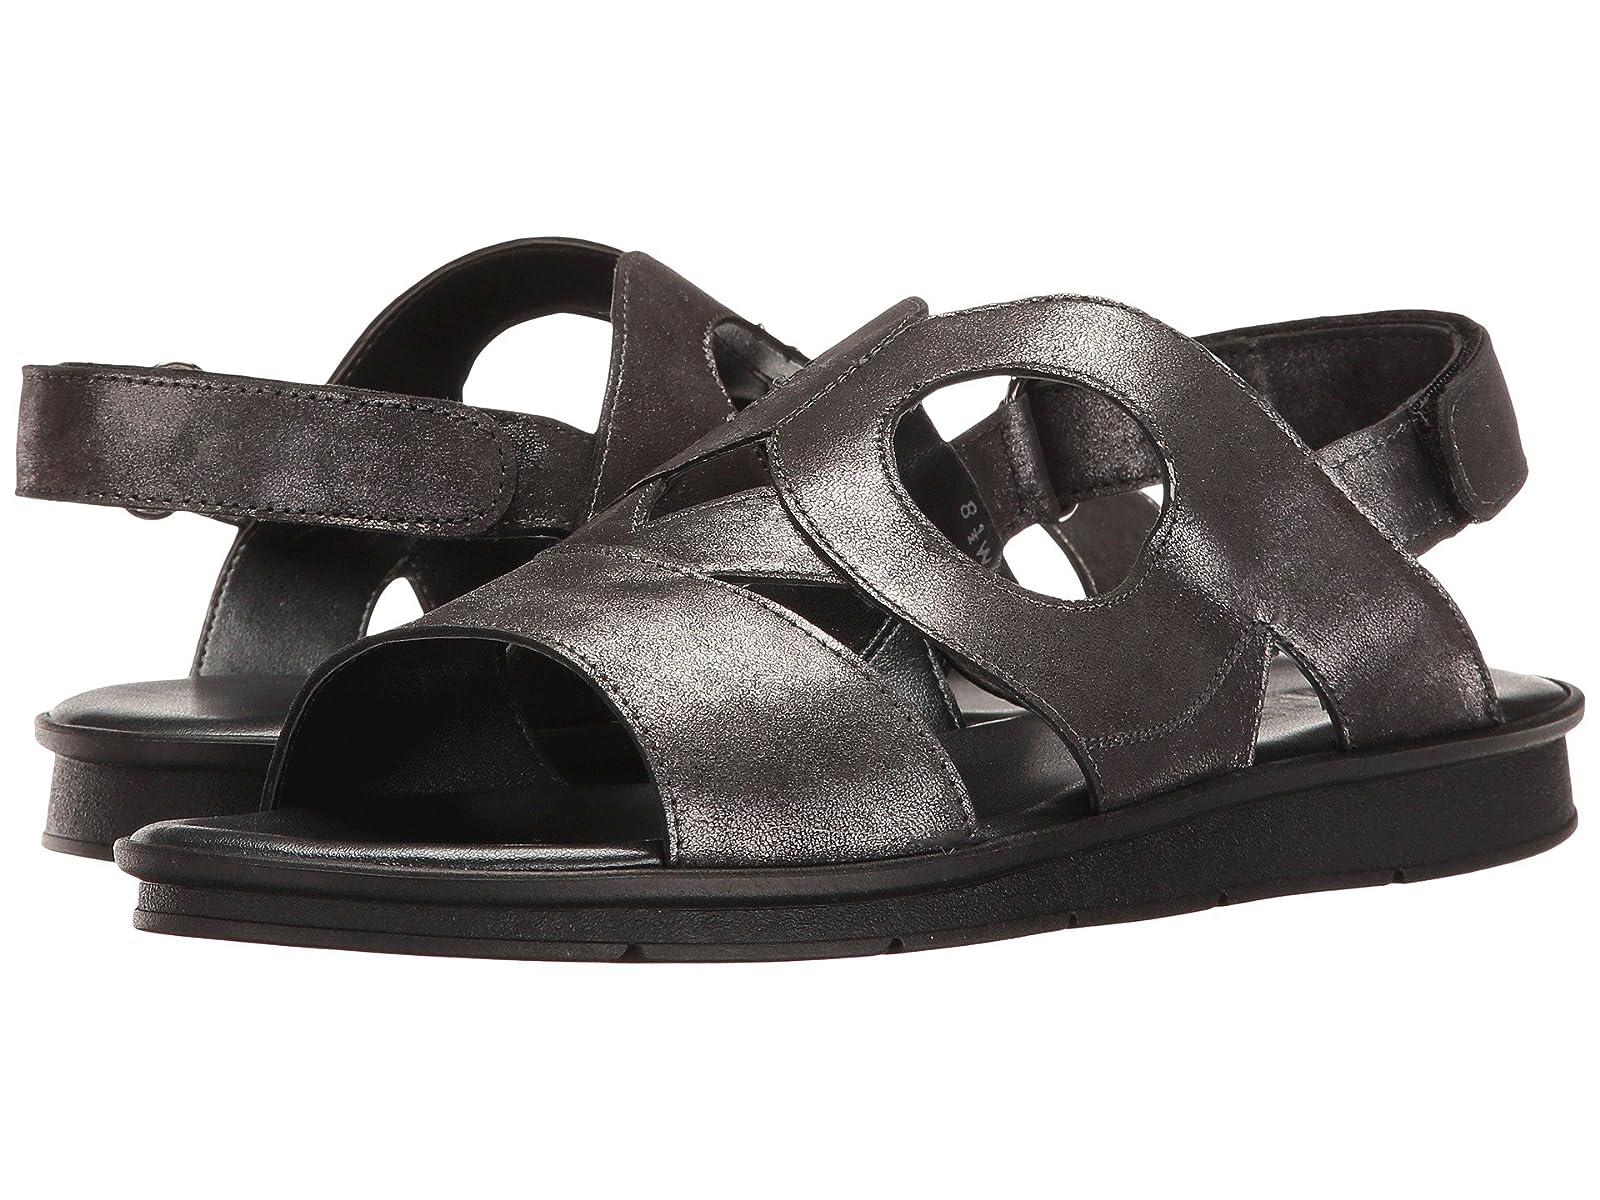 Sesto Meucci TenaxCheap and distinctive eye-catching shoes